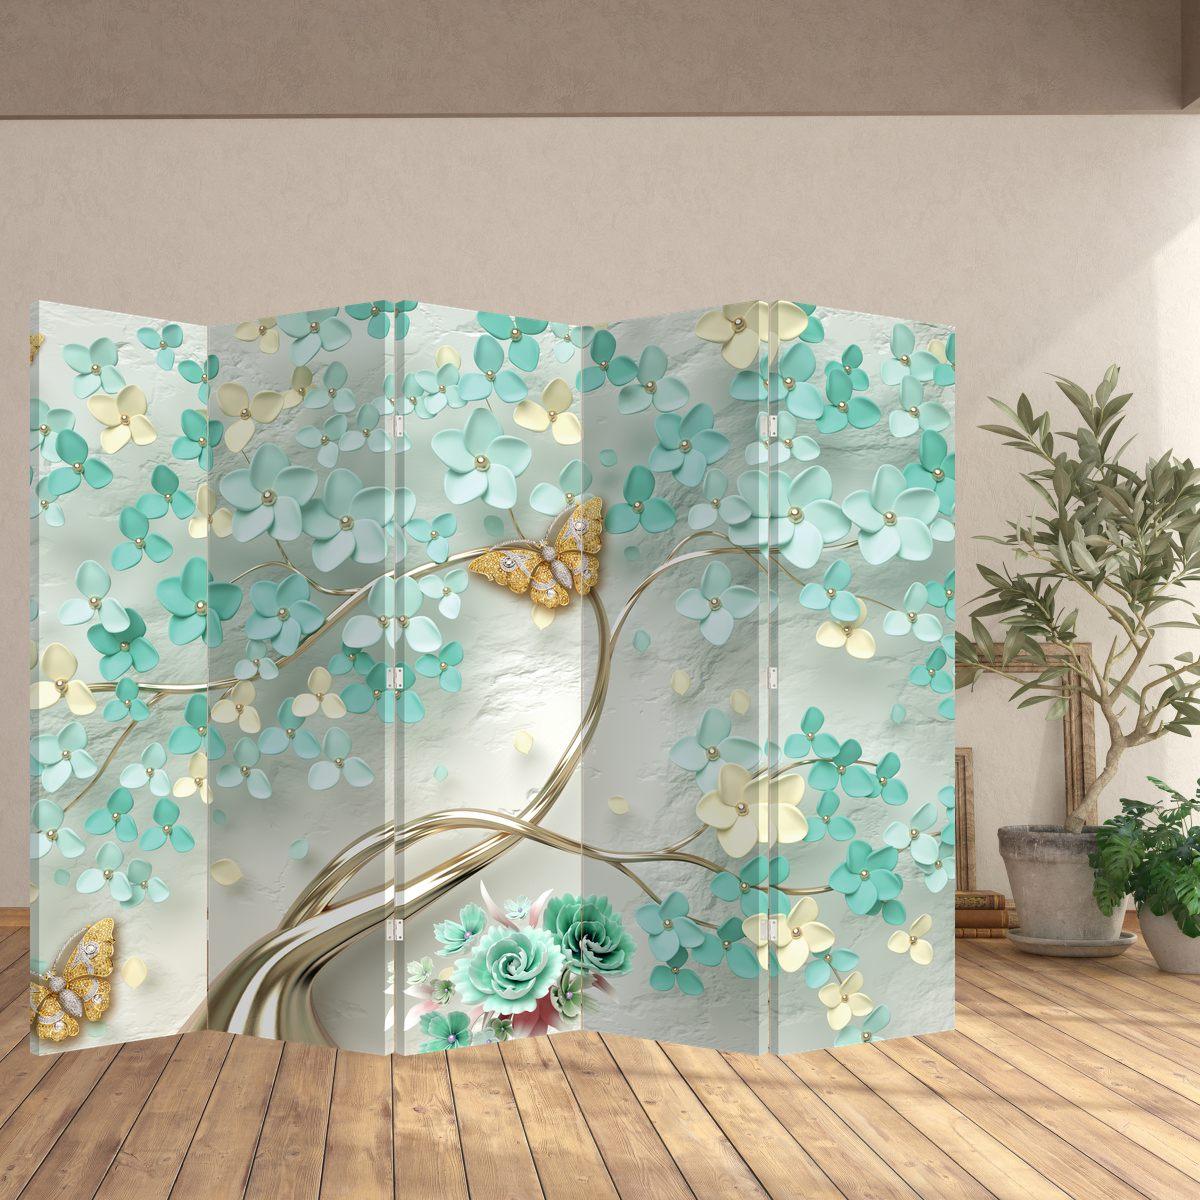 Paraván - Kvetina s motýľmi (P020716P225180)